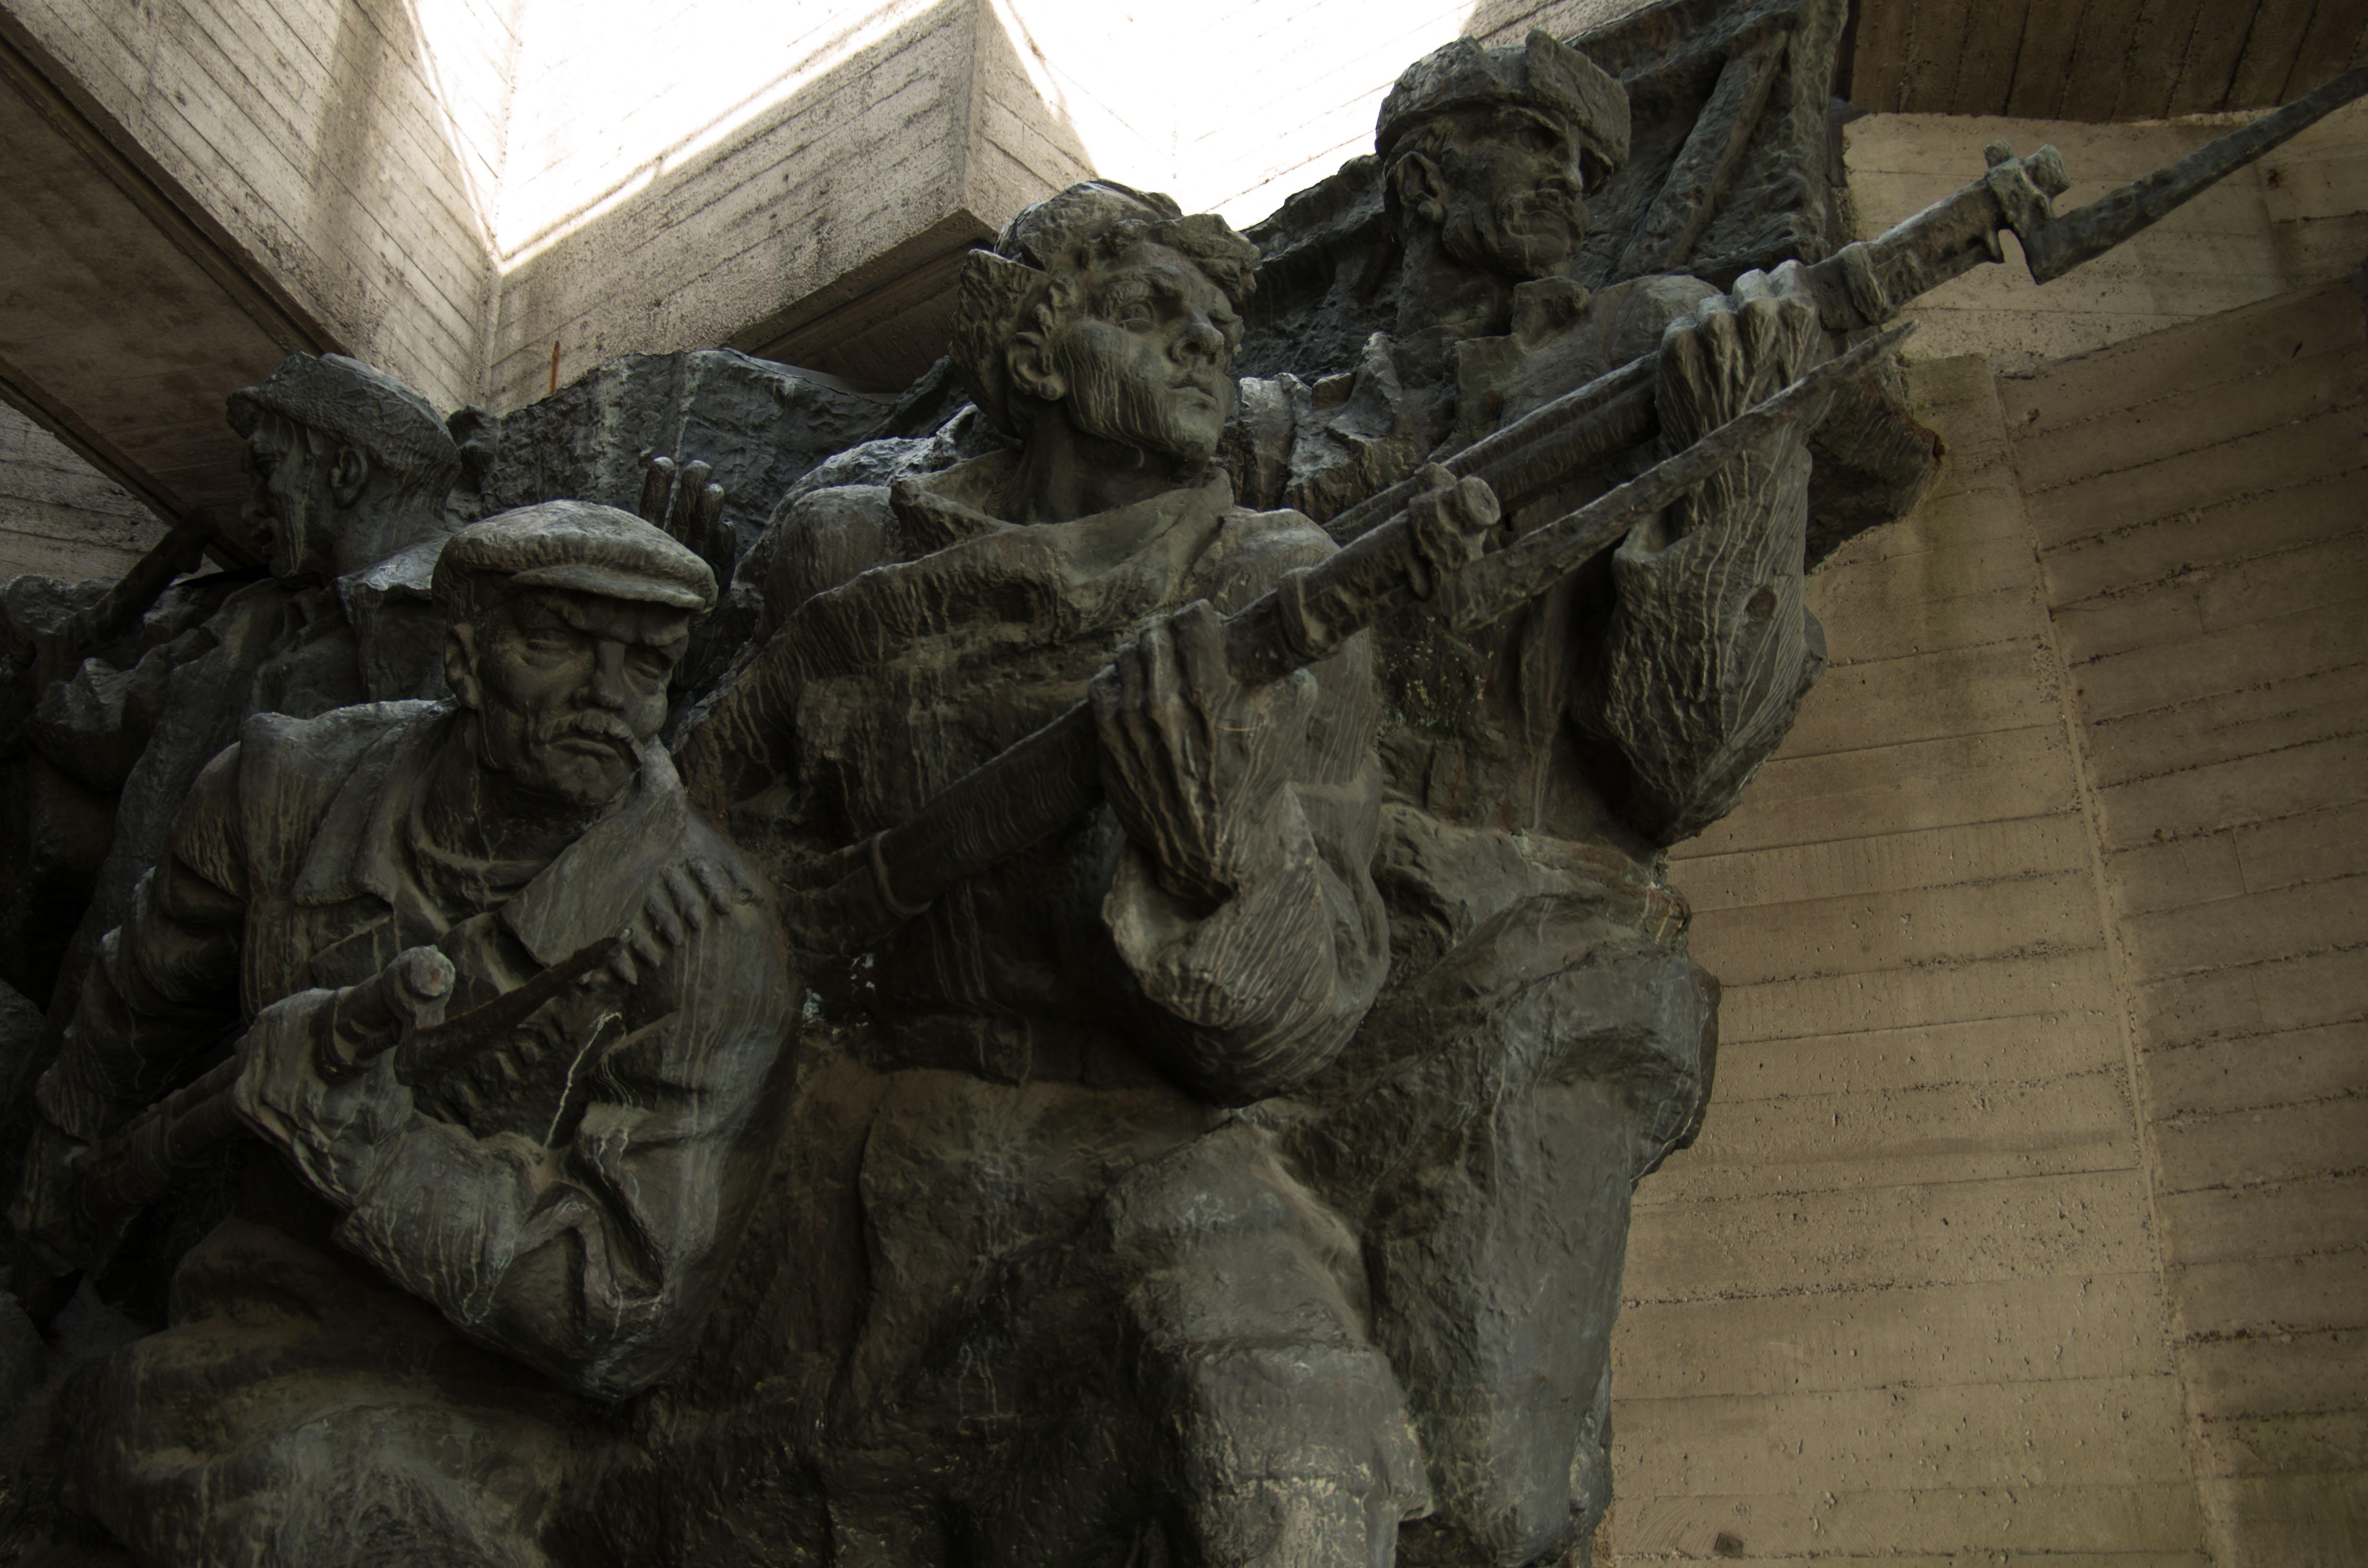 Några av alla statyer kring monumentet